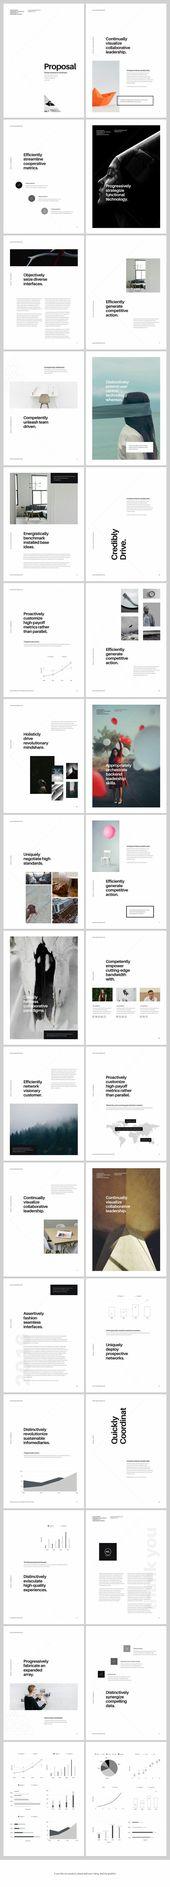 (notitle) – Layout design